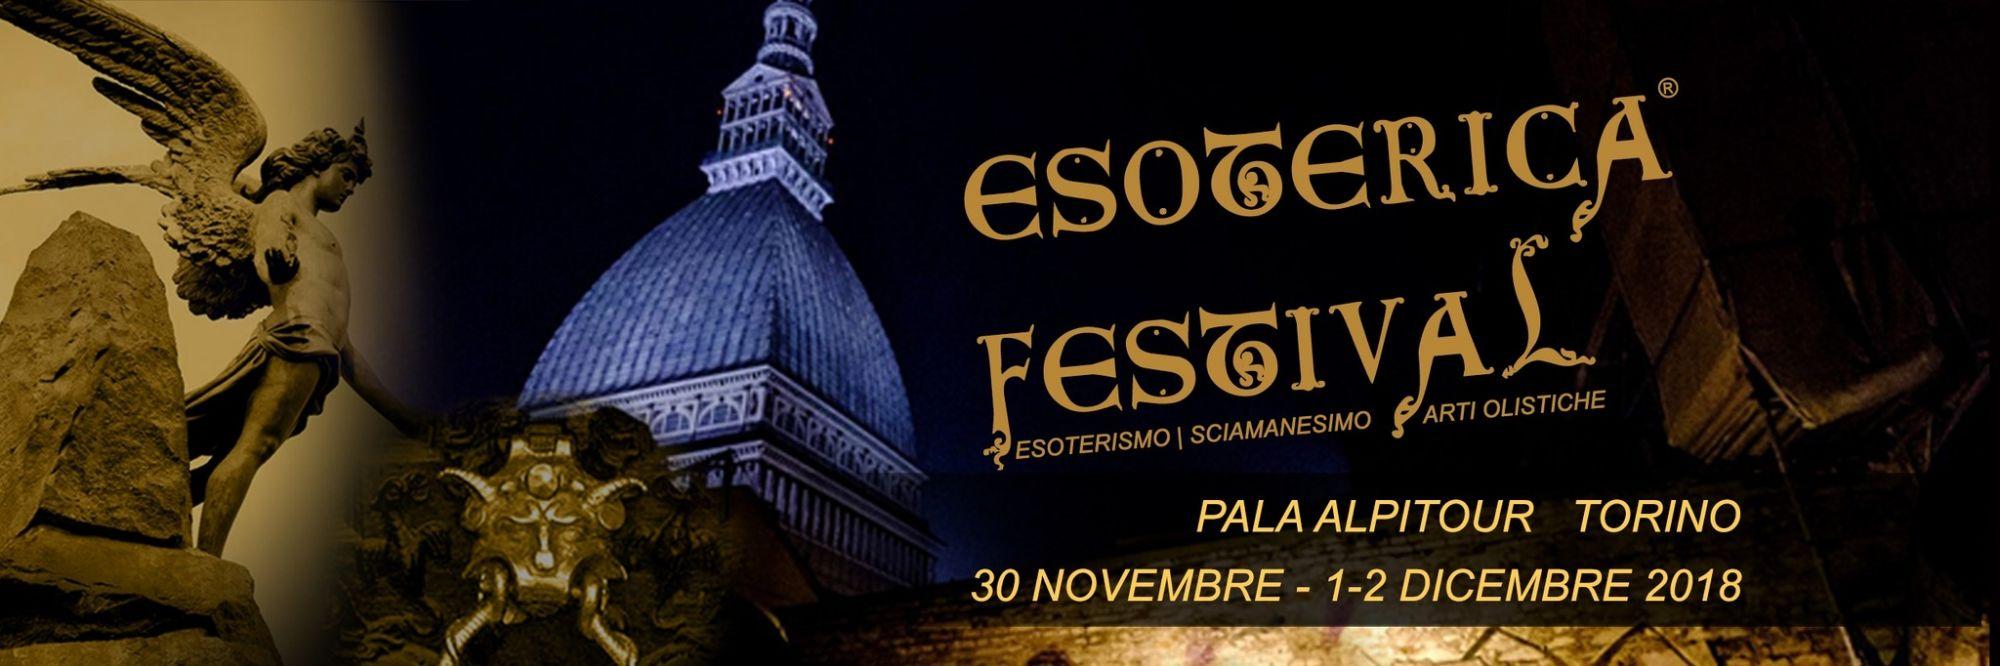 Esoterica festival Torino